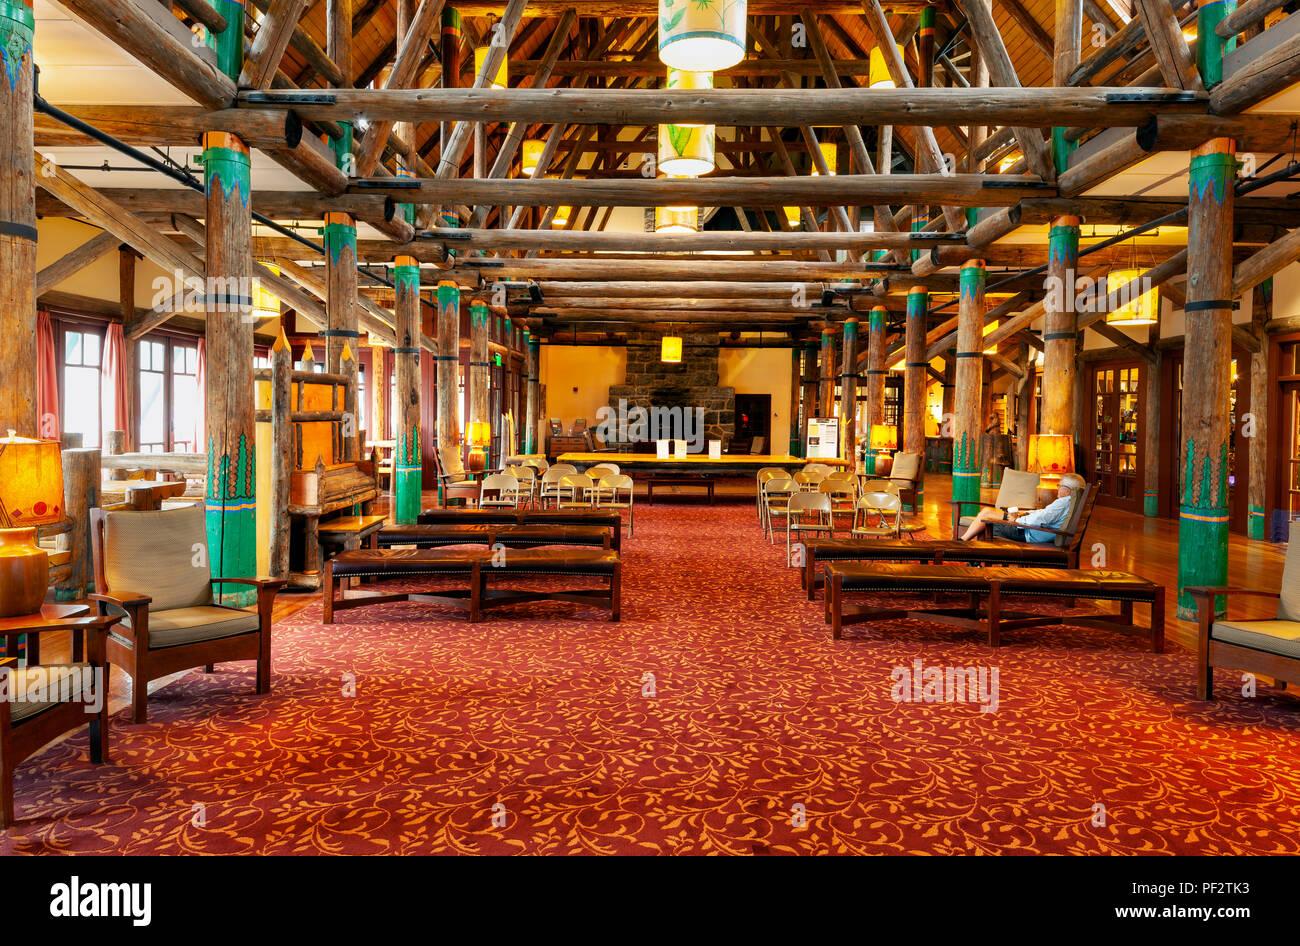 WA14764-00...WASHINGTON - Lobby of the Paradise Inn at Mount Rainier National Park. - Stock Image